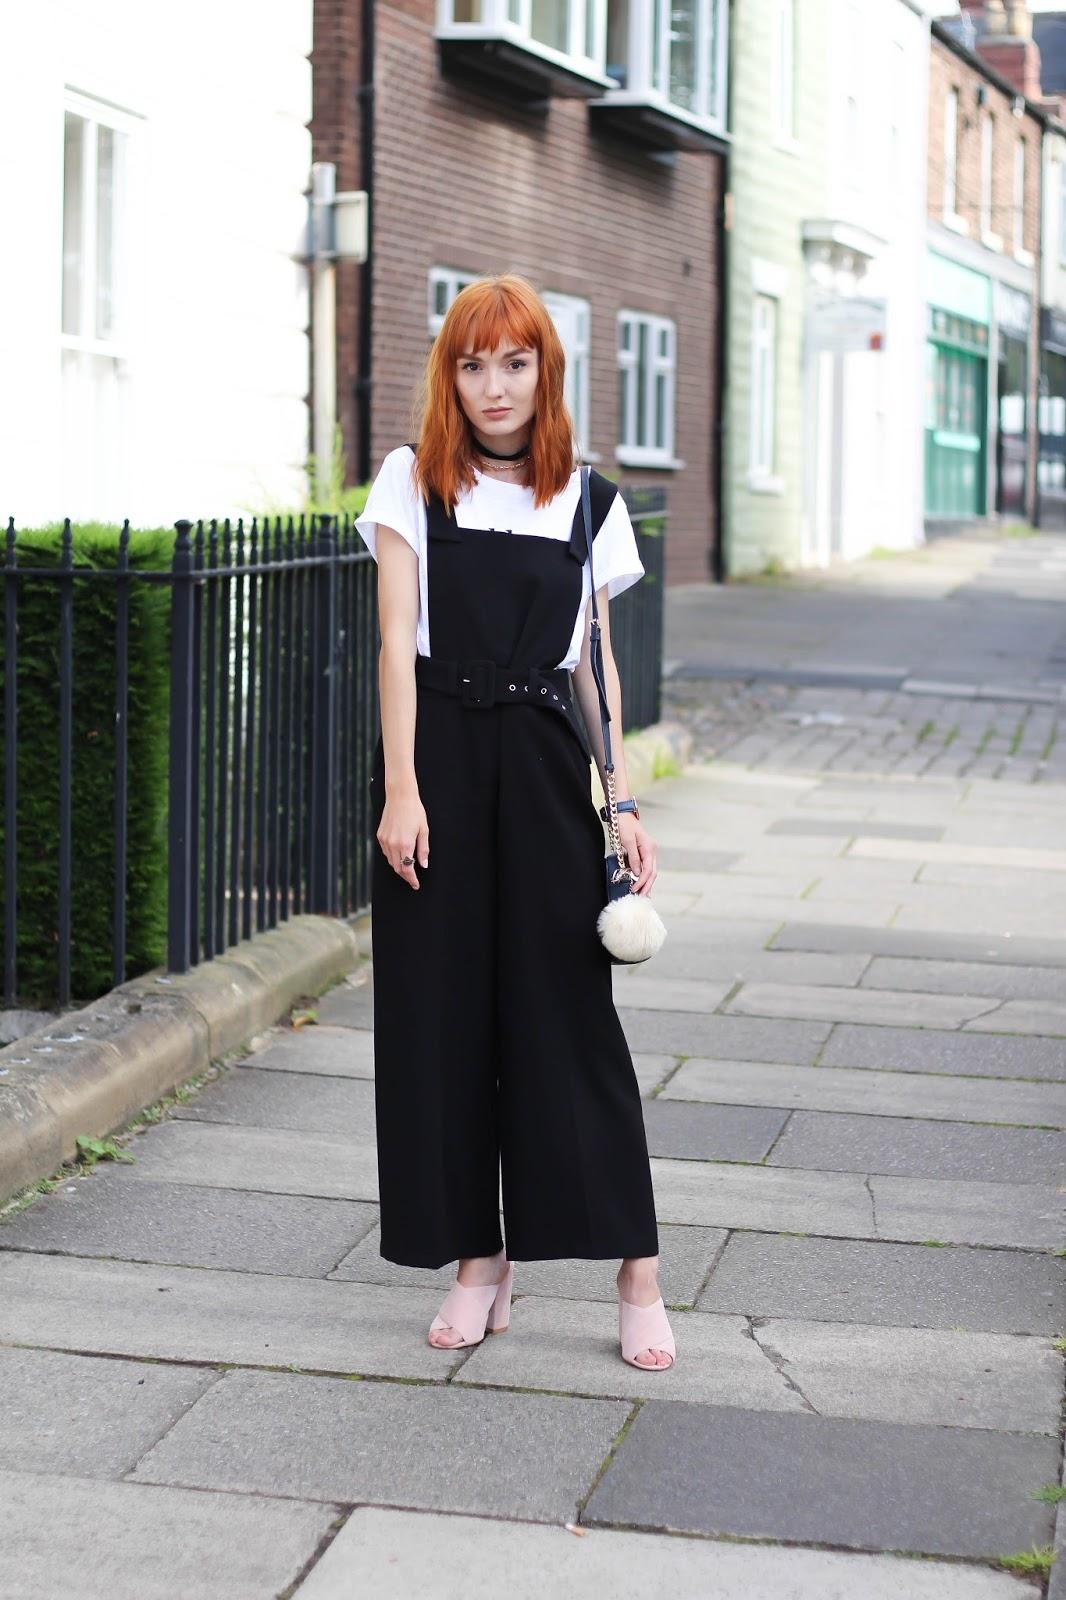 001109dd12a1 Everyday Chic | Salt and Chic // UK Fashion Blog | Bloglovin'